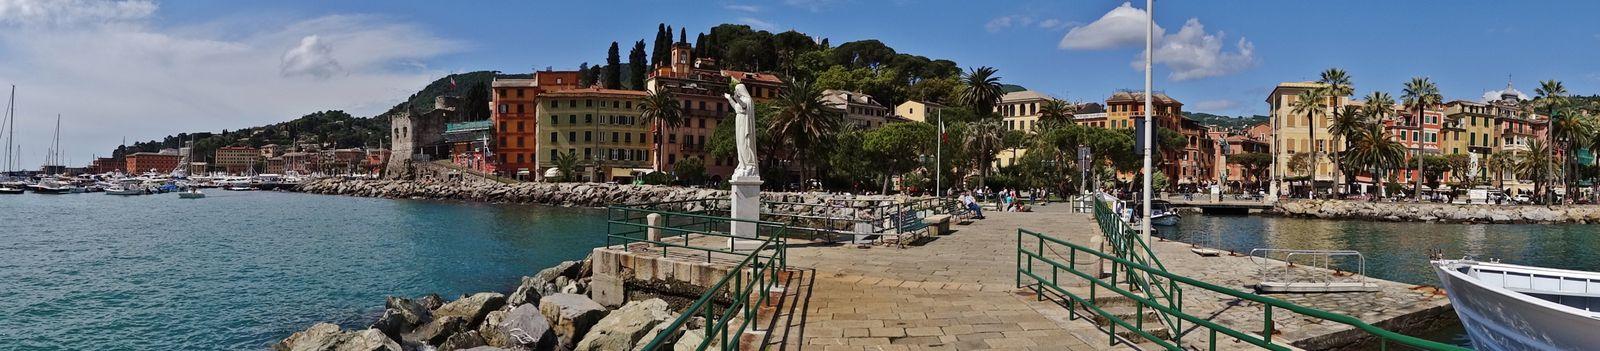 italie ligurie santa margherita portofino portovenere savona lerici valloria terre photo